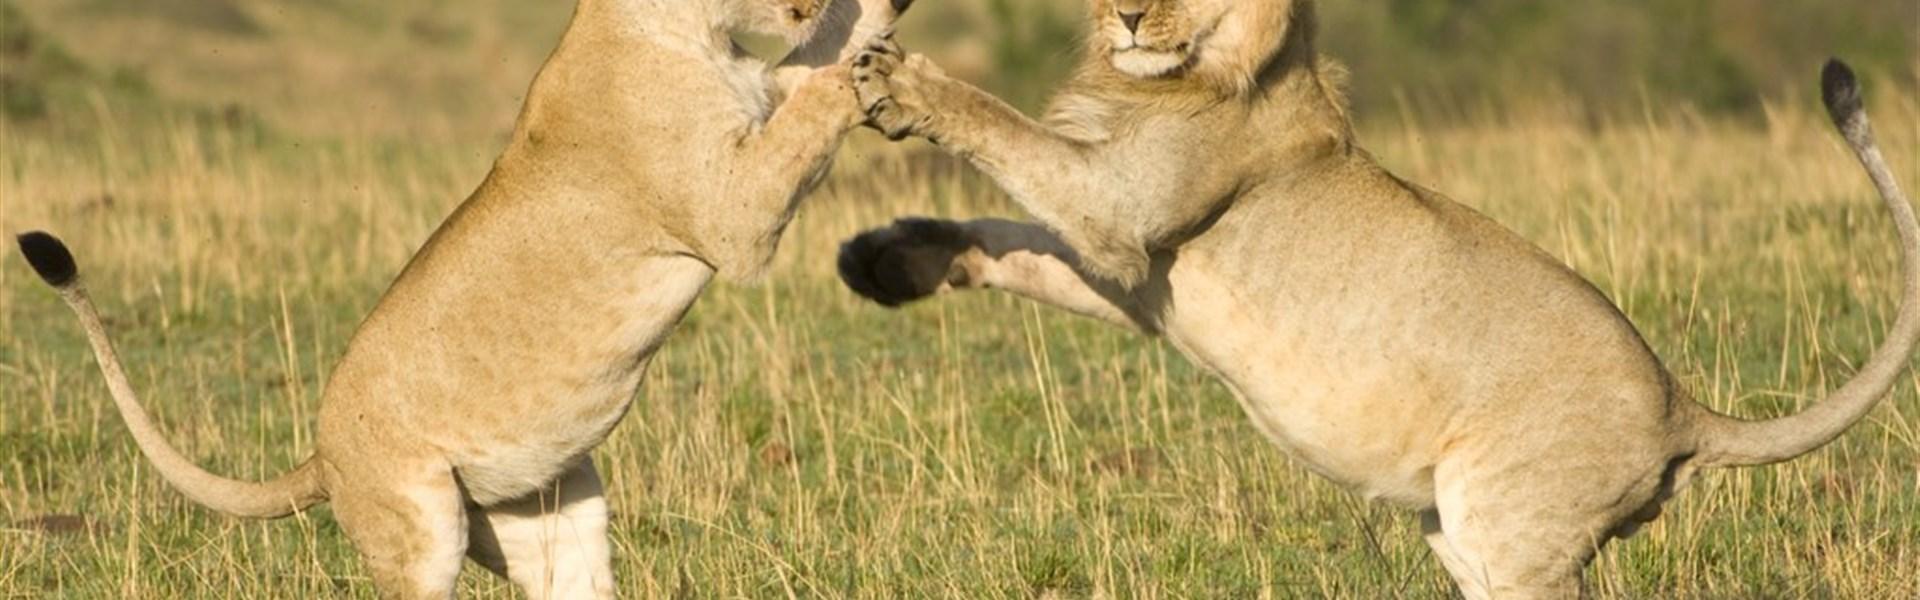 Luxusní safari a pobyt na Zanzibaru: The best of Tanzania -